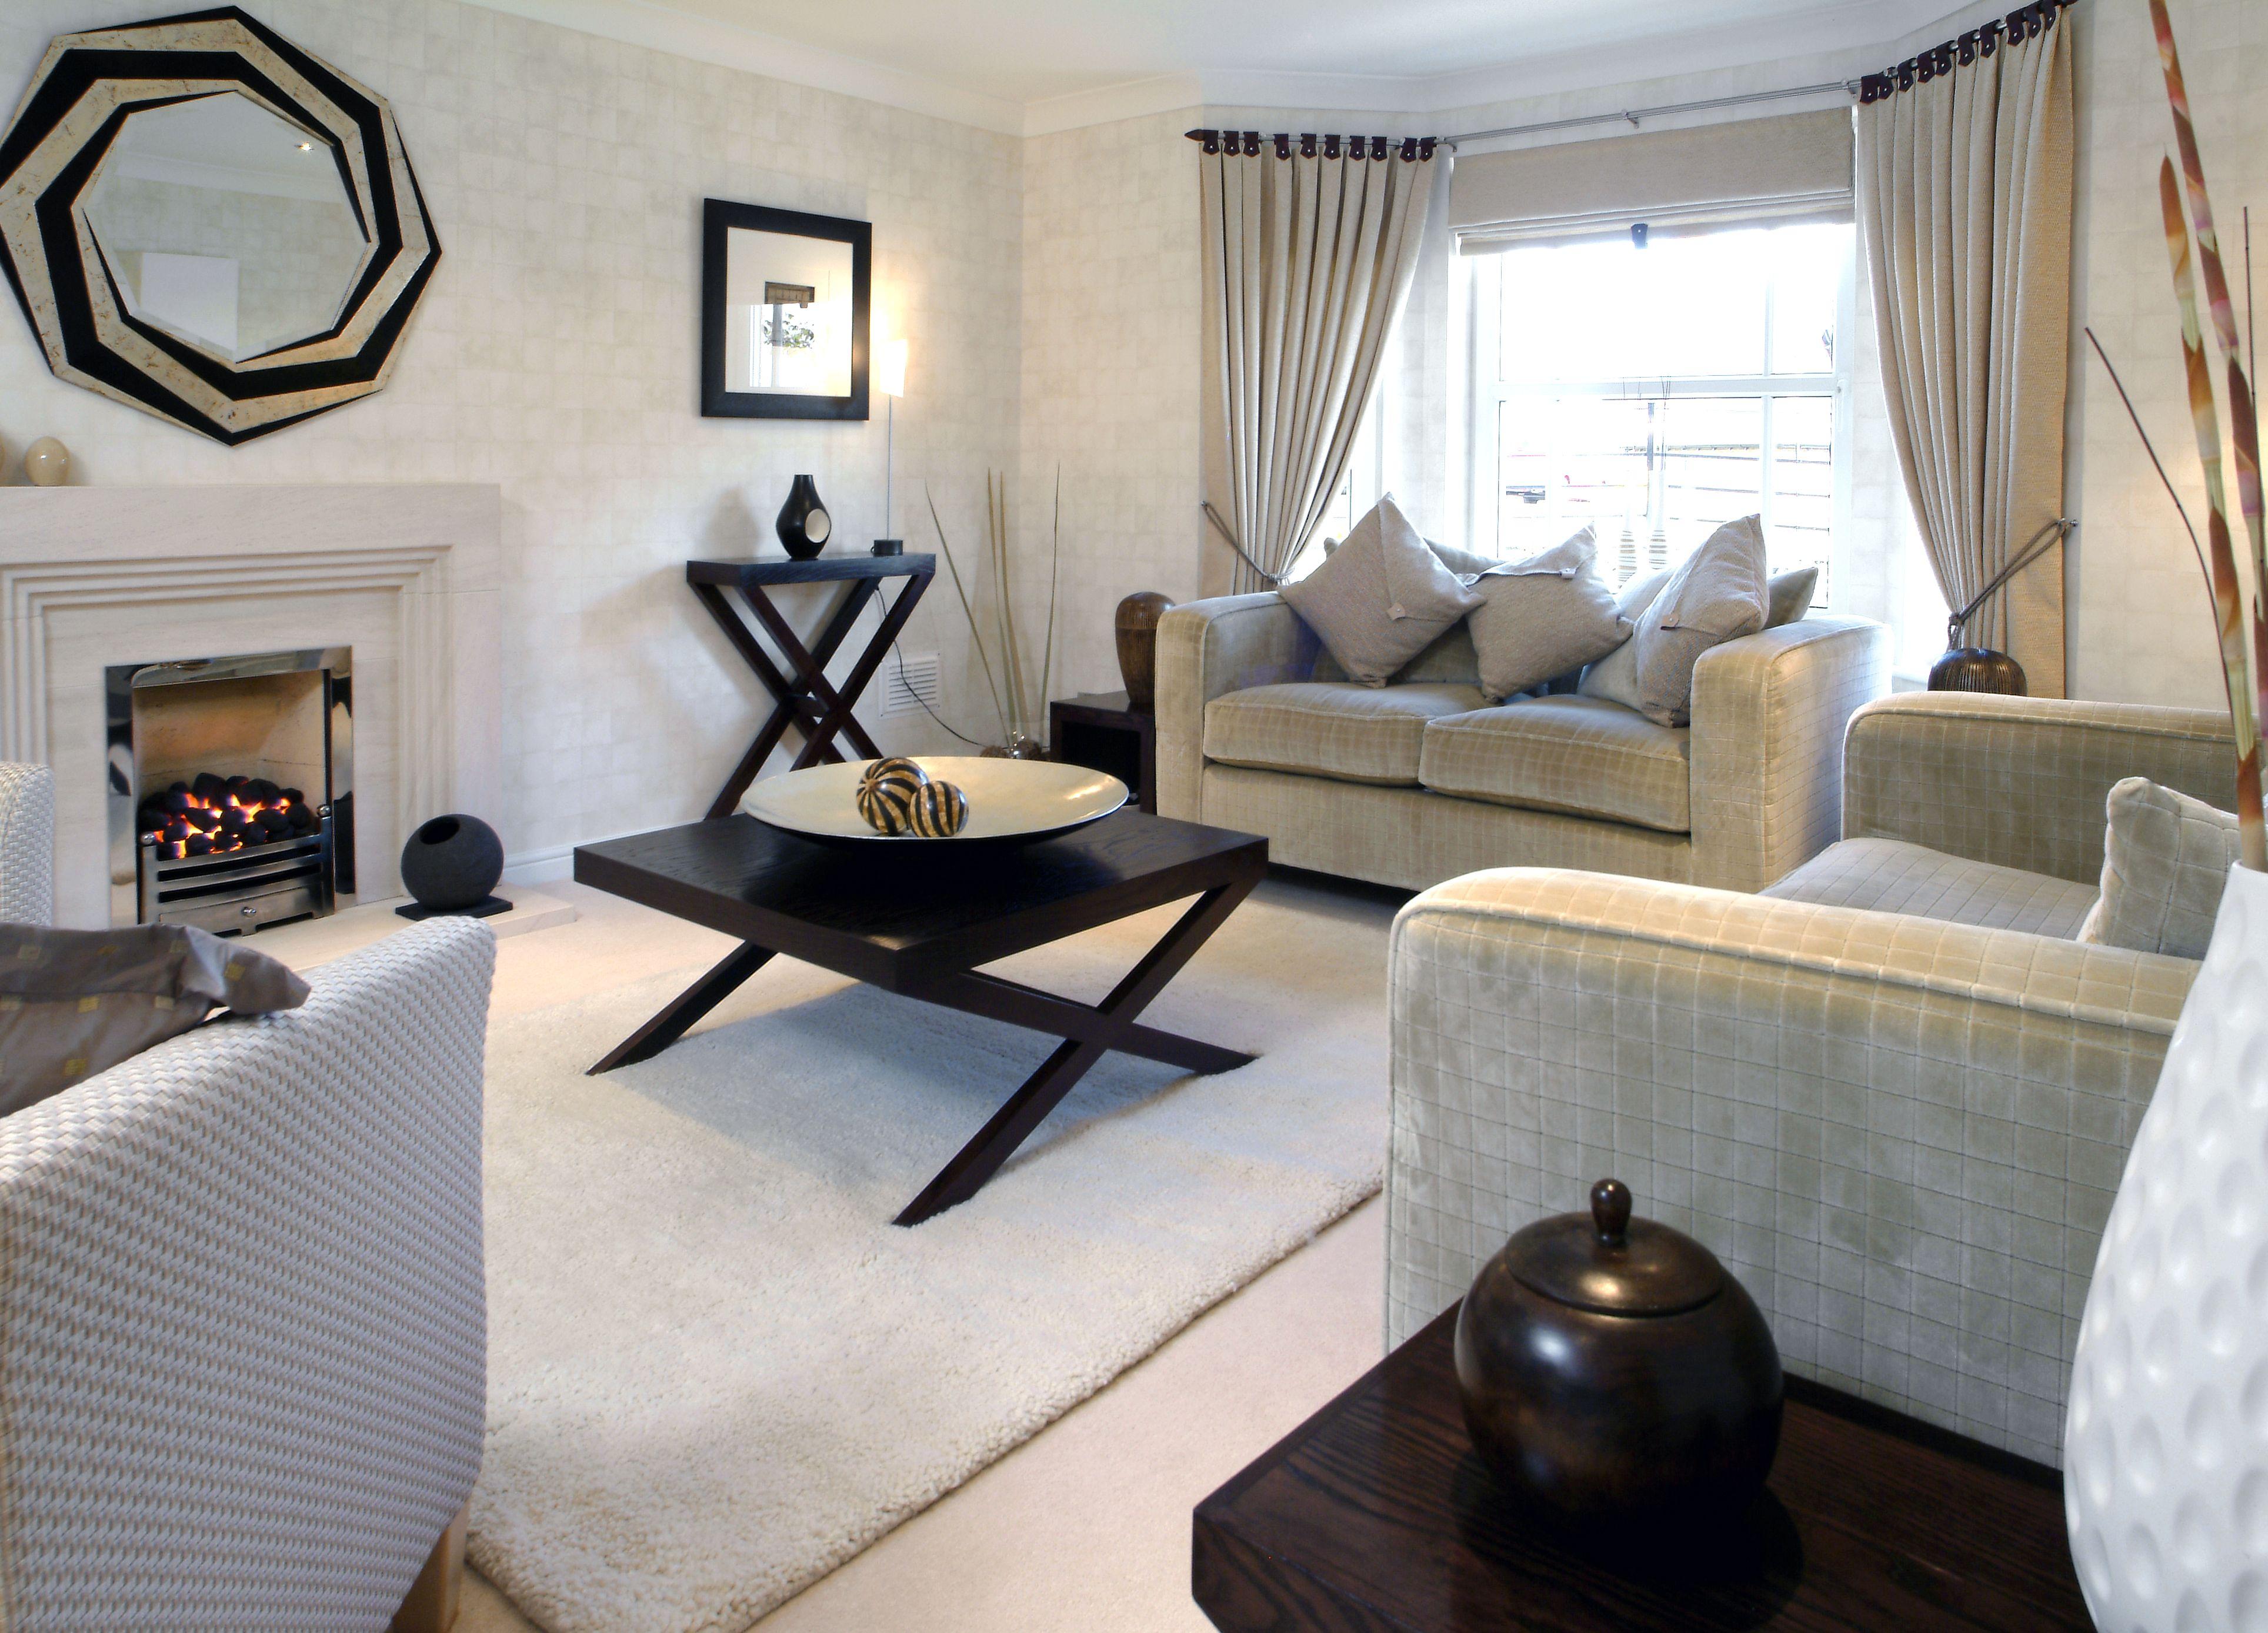 Show home interior age david cadzow also new house pinterest rh